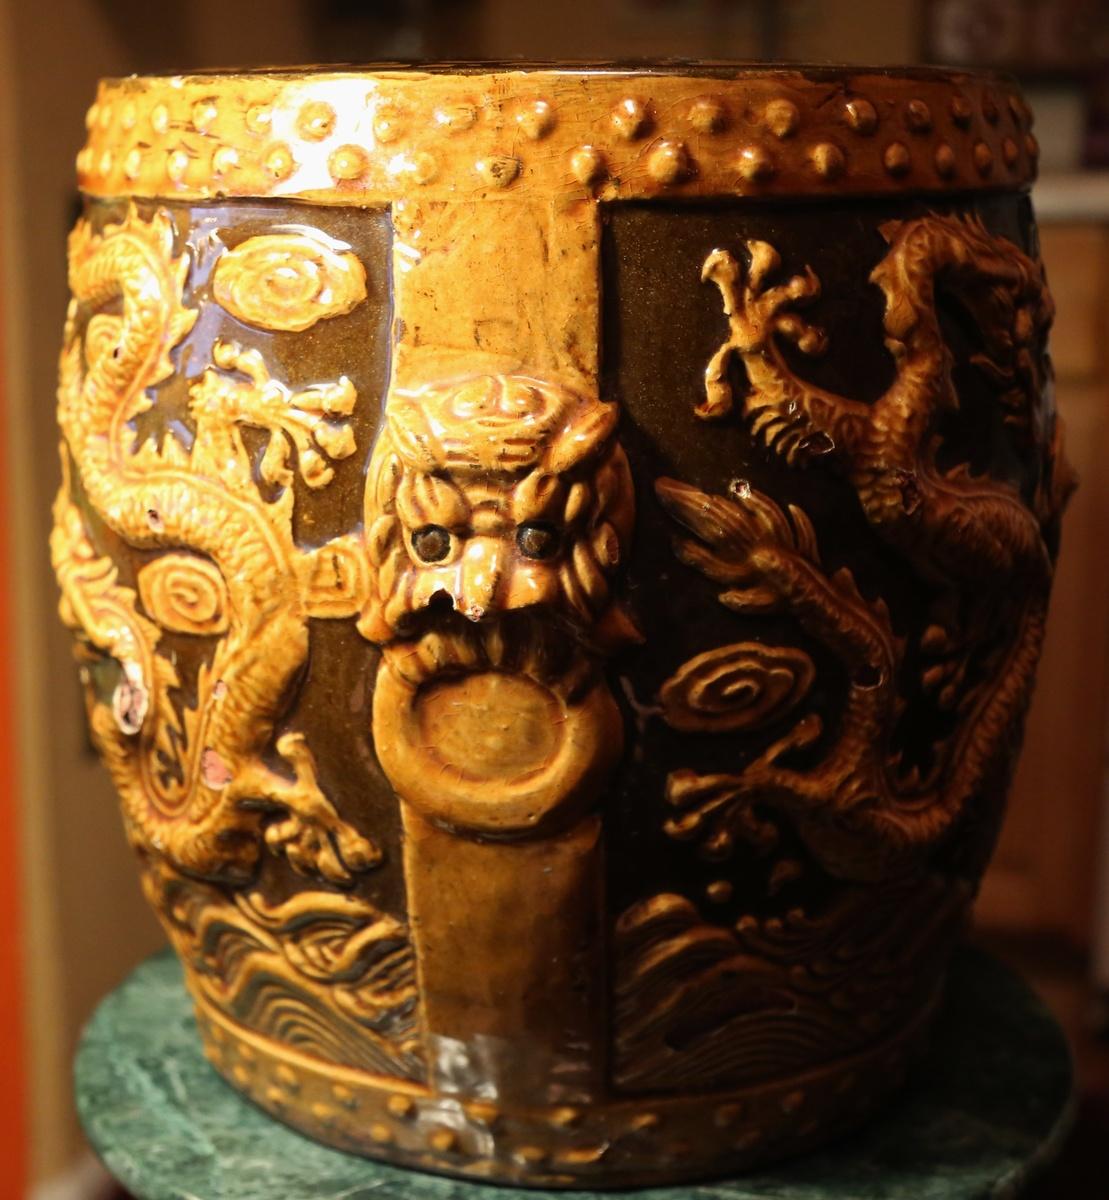 Ceramic Garden Stool - China | Collectors Weekly